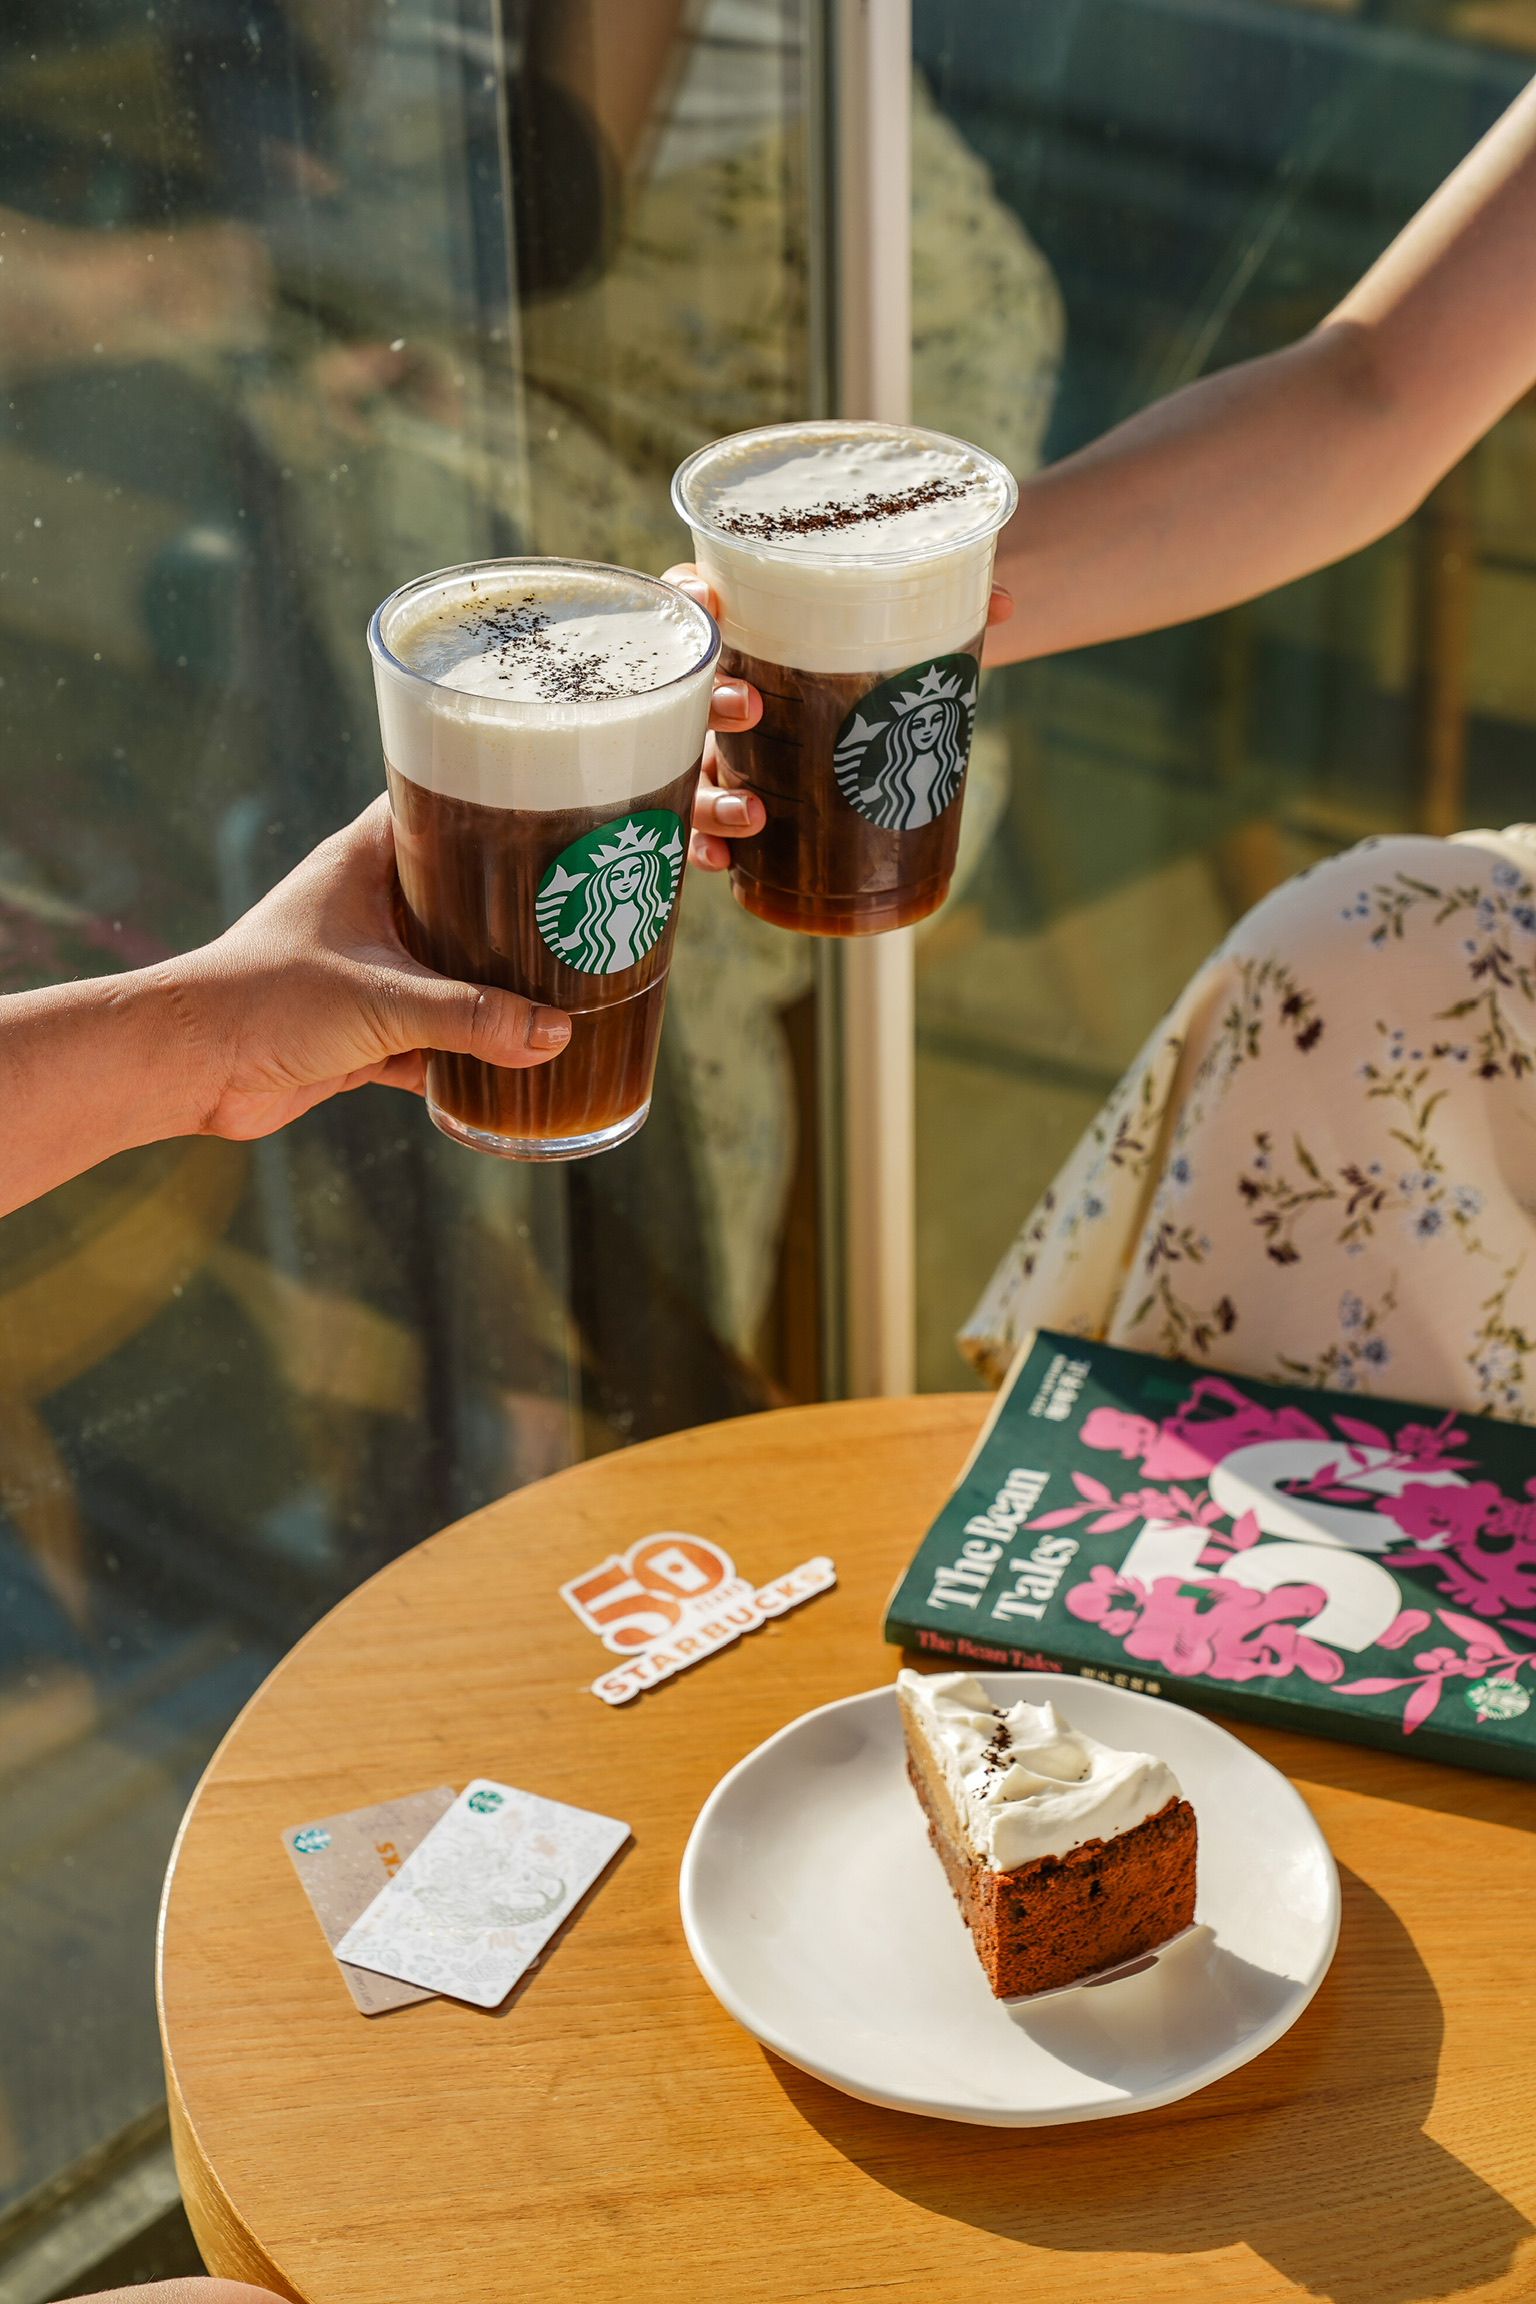 Starbucks 迎来 50 周年,推出中国秋日限定产品